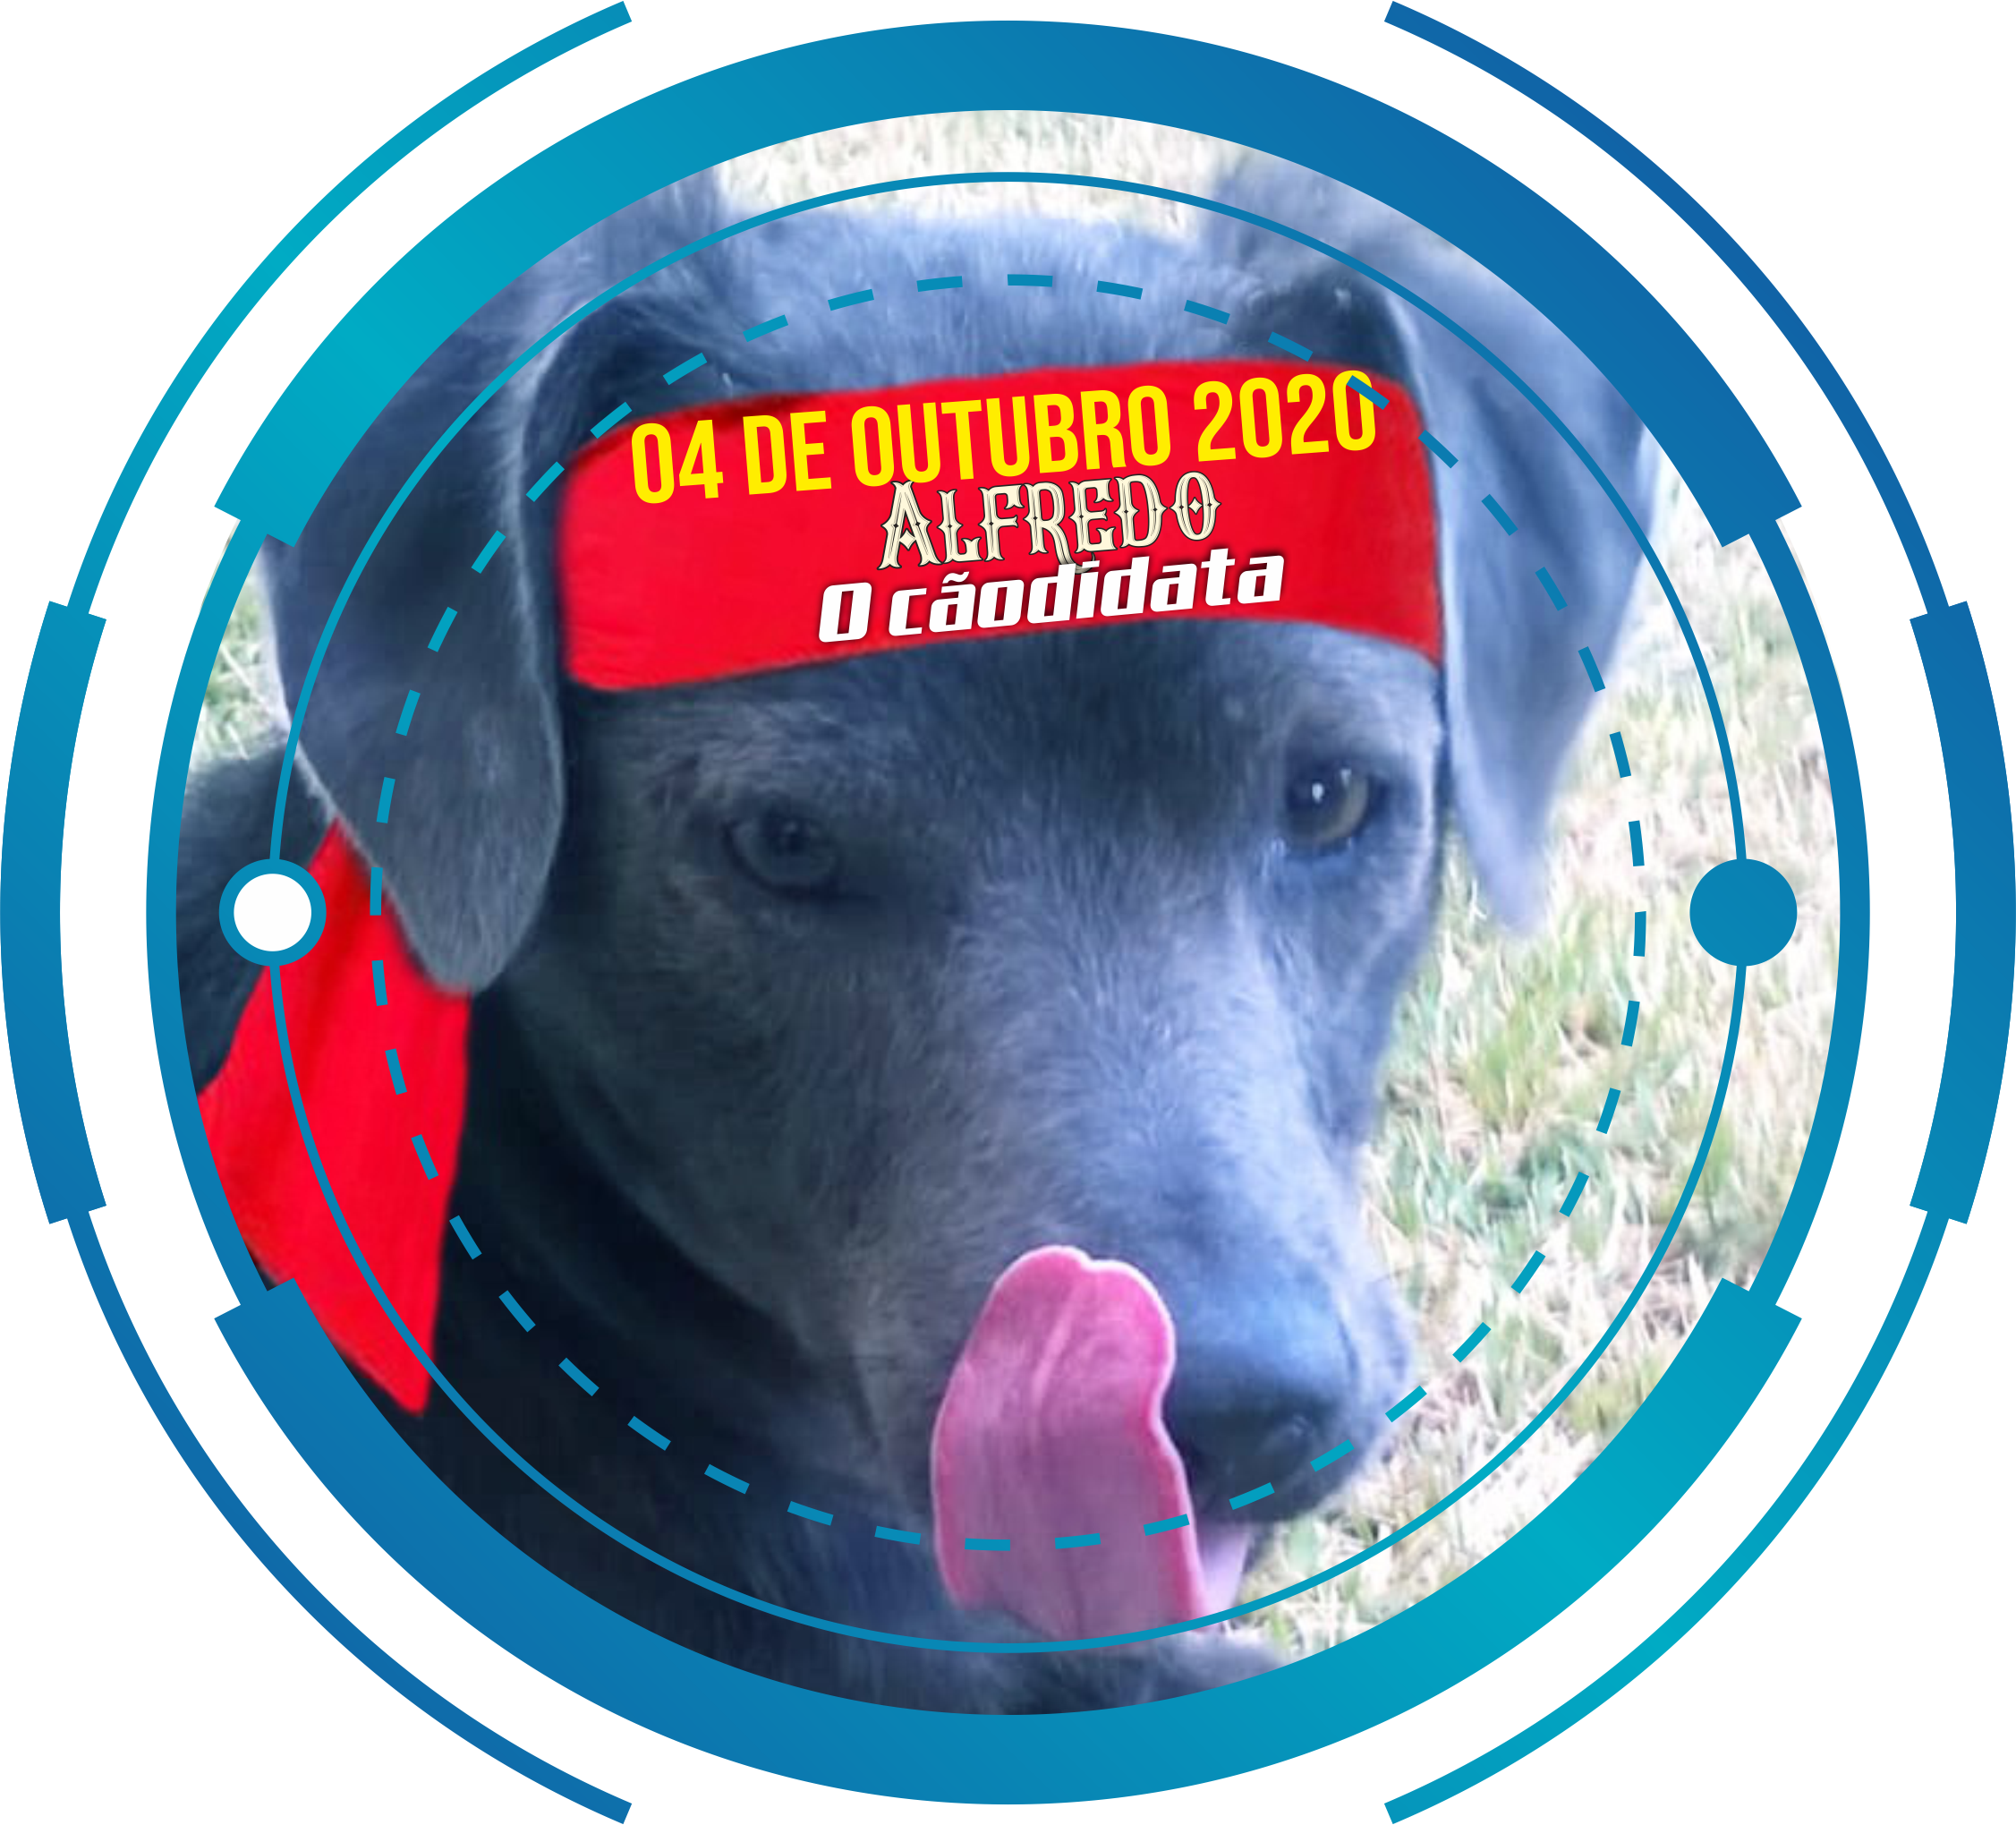 Alfredo, o Cãodidata está de olho nos Prefeitáveis, nos candidatos a Prefeito e nos candidatos a Vereador